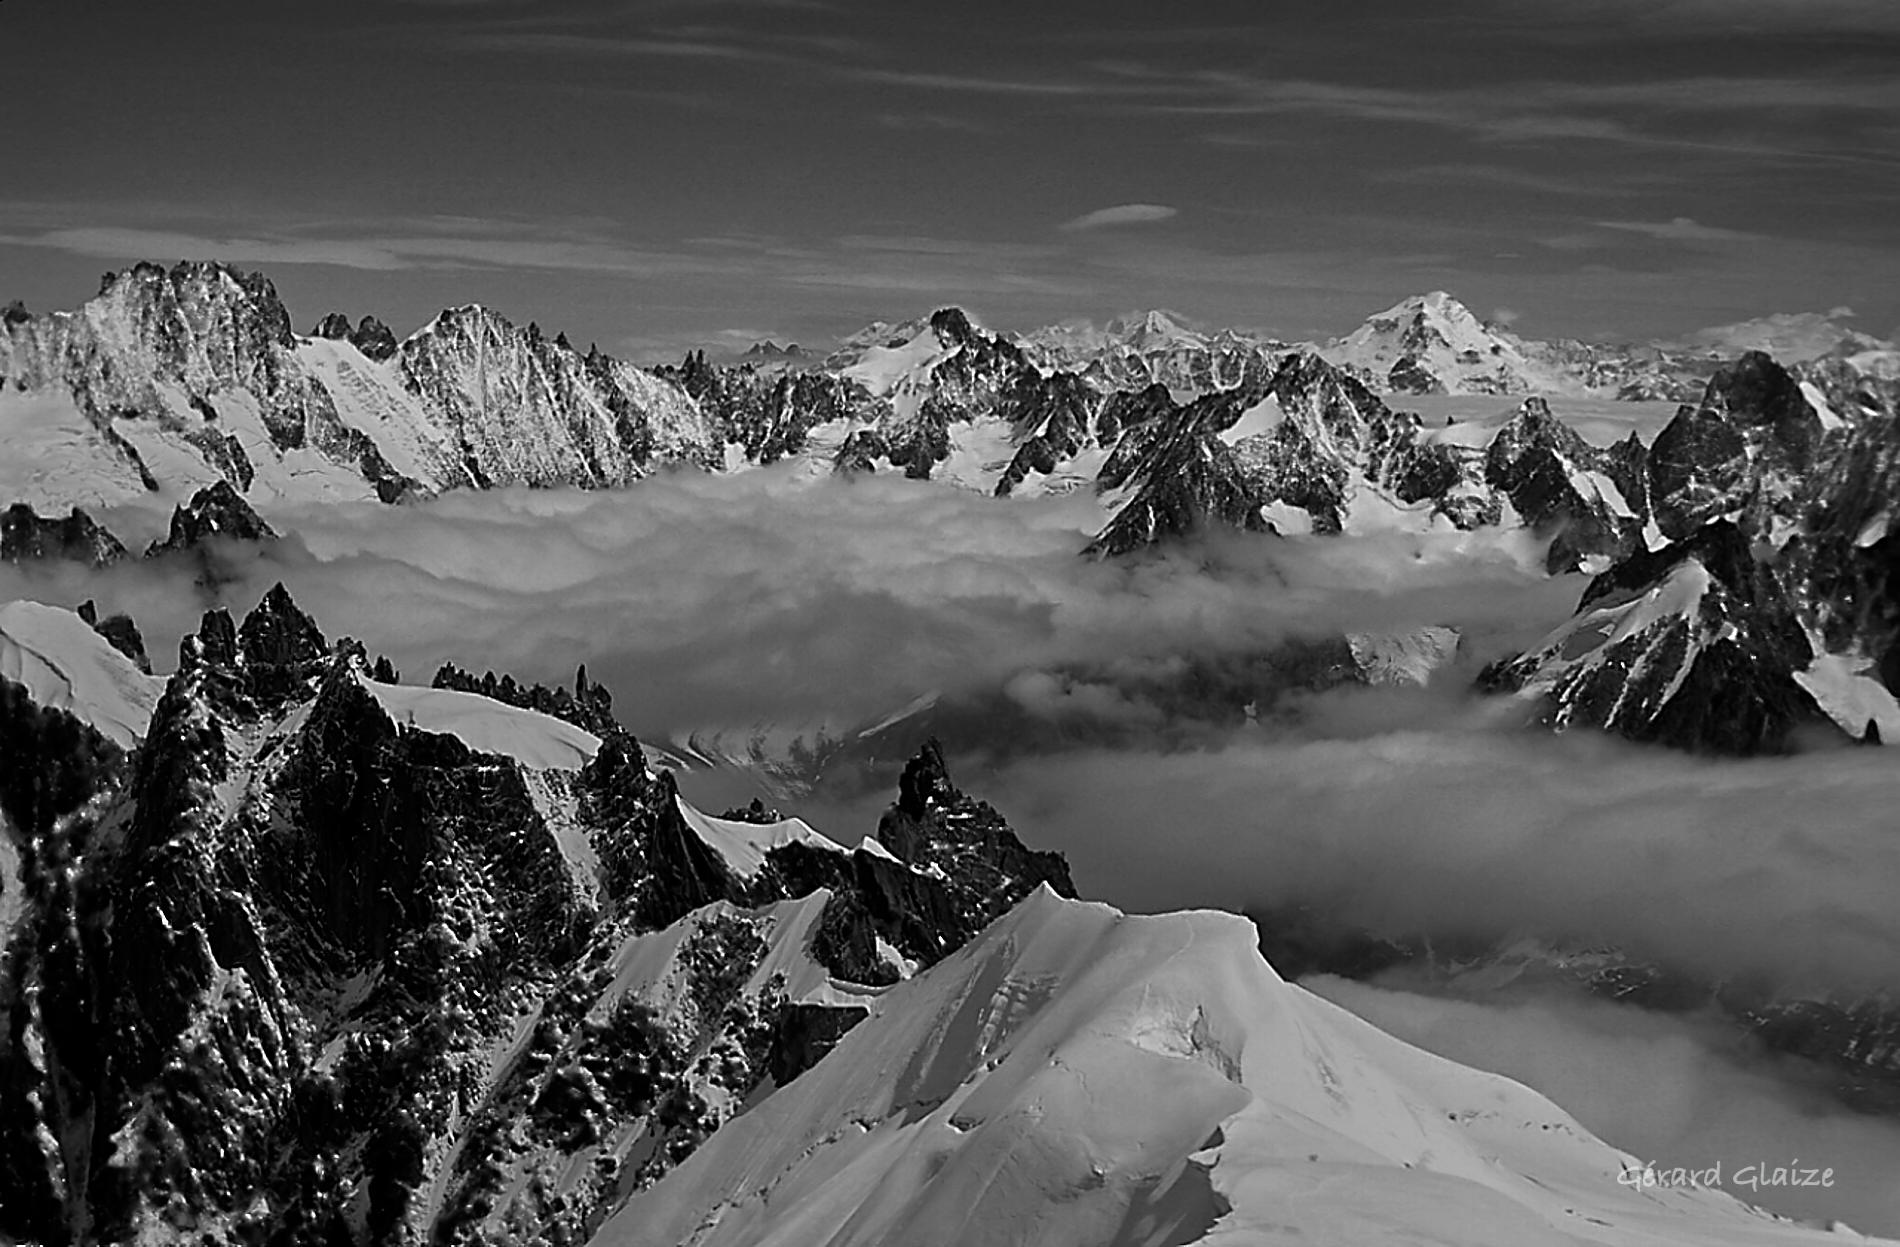 Wallpaper Montagne Mountain Alpes Alps Paysage